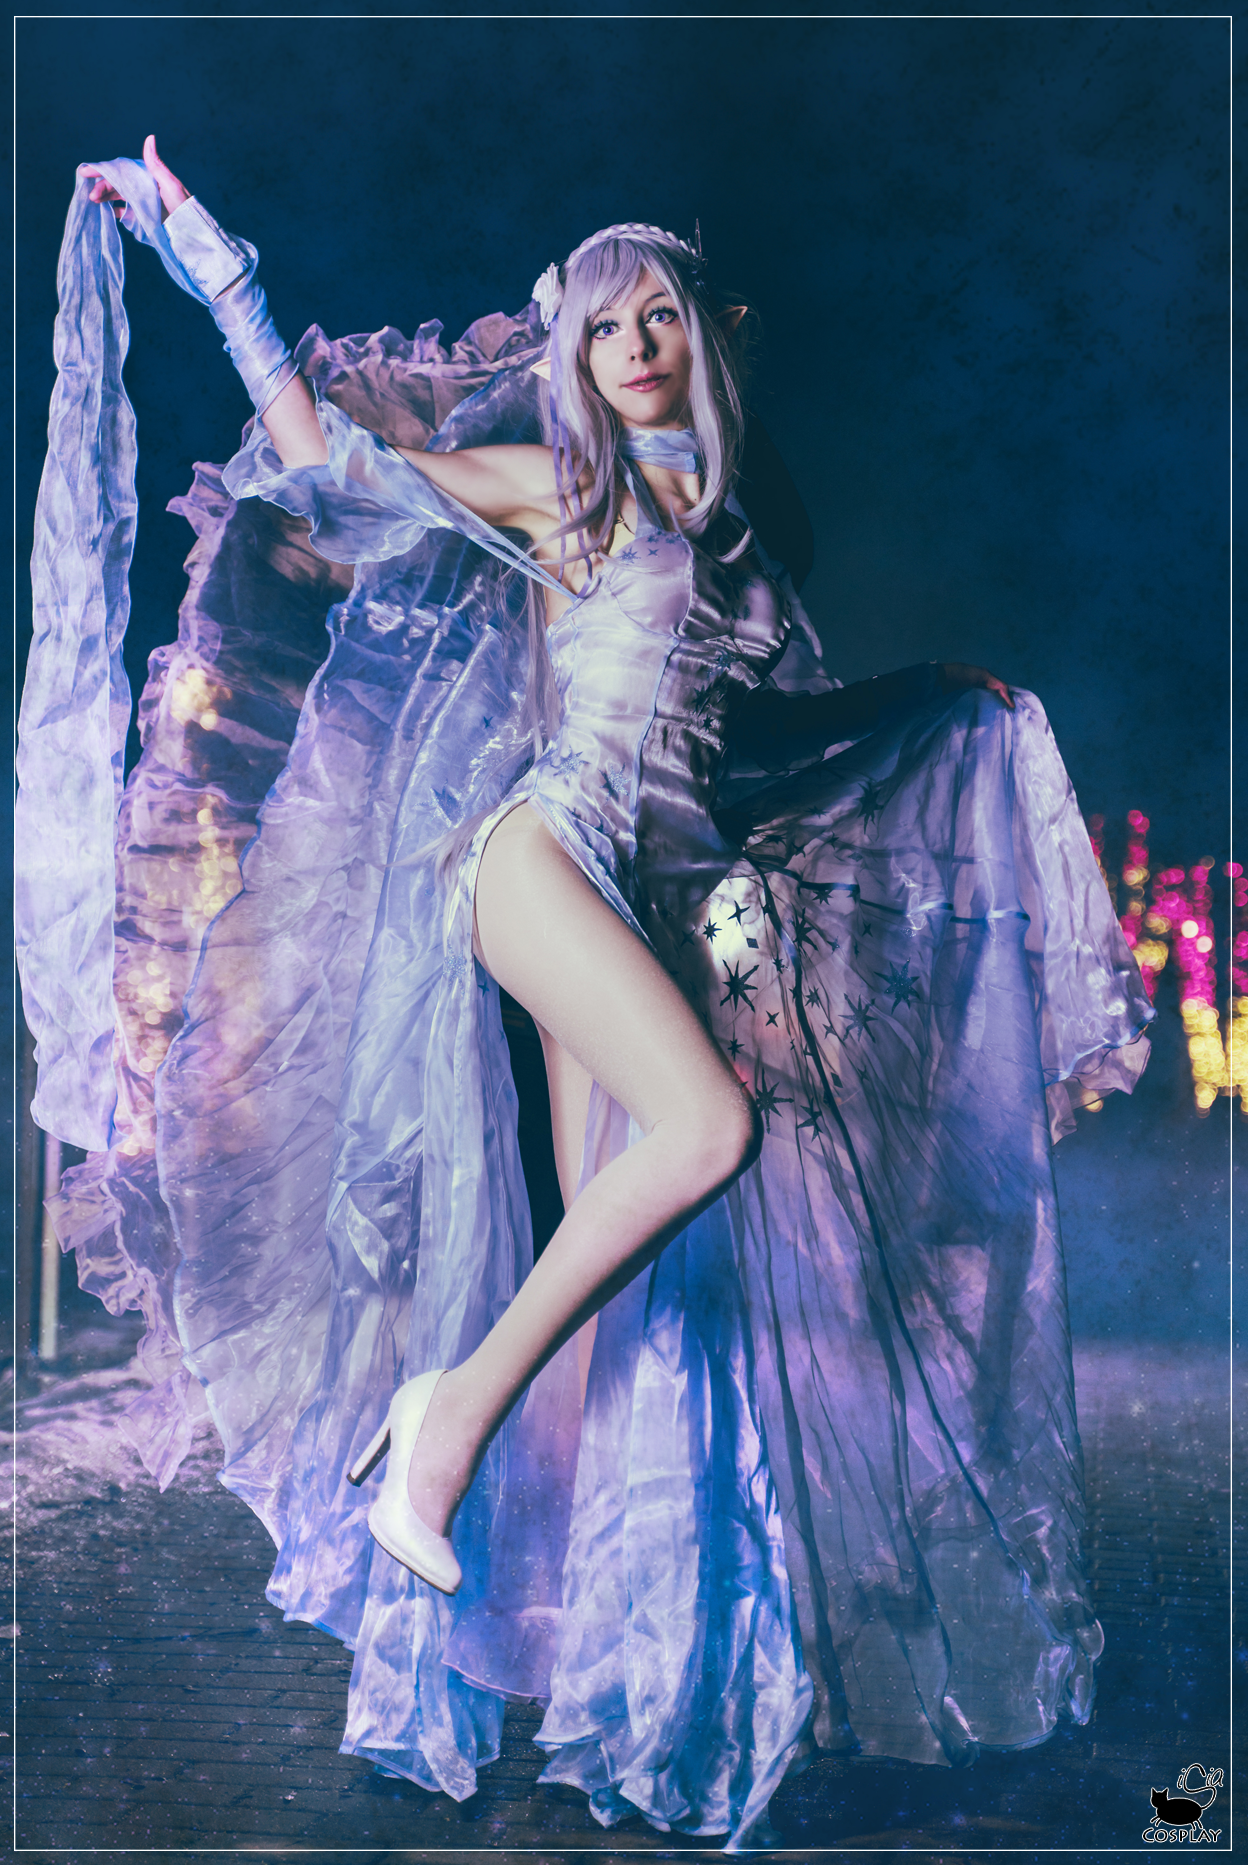 Emilia cosplay